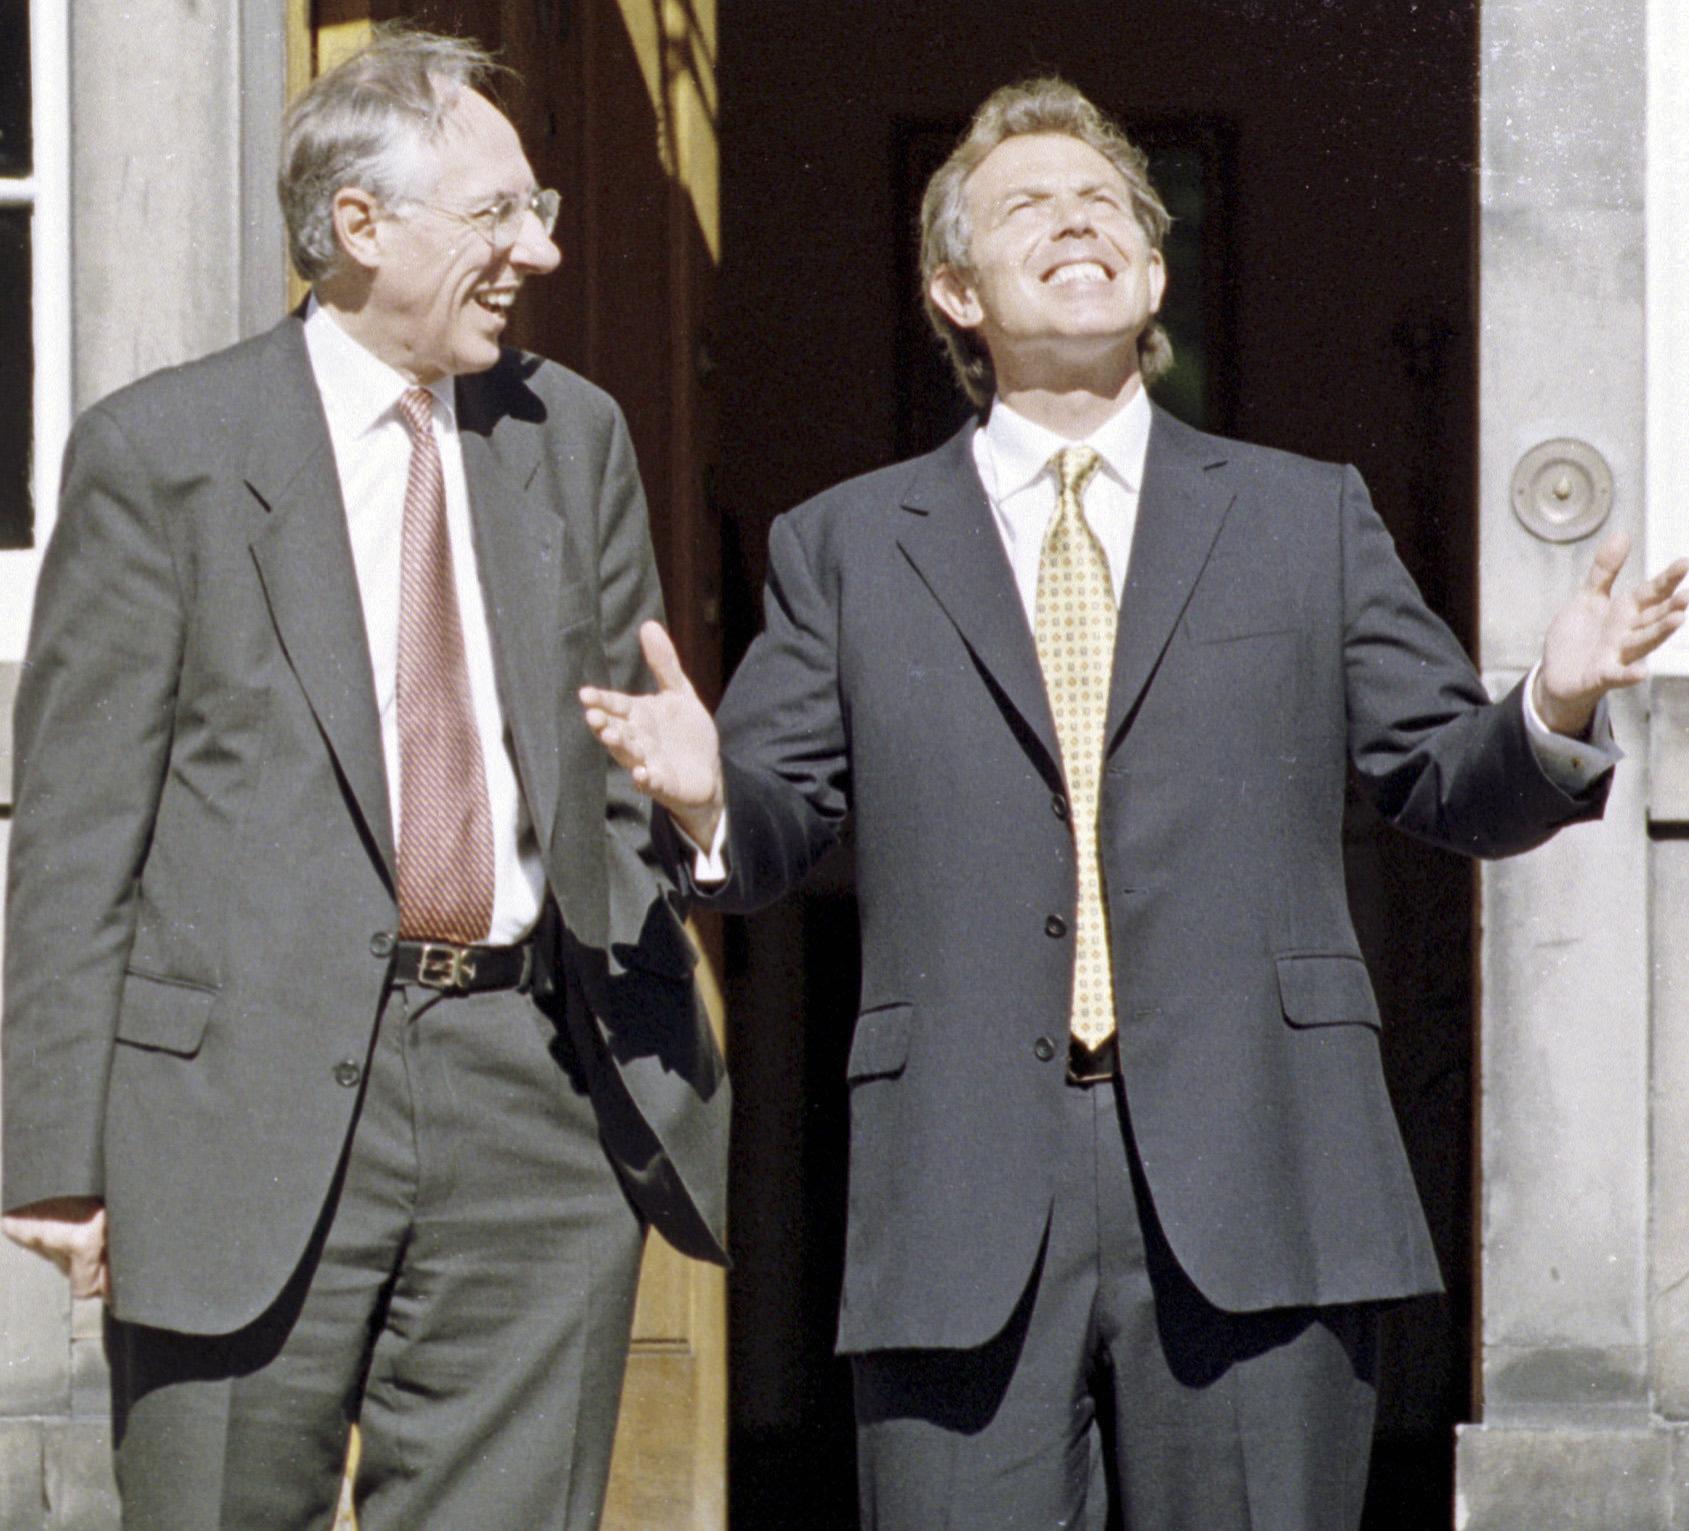 (20-20 Vision) Tony Blair meets Donald Dewar in the sushine.jpg